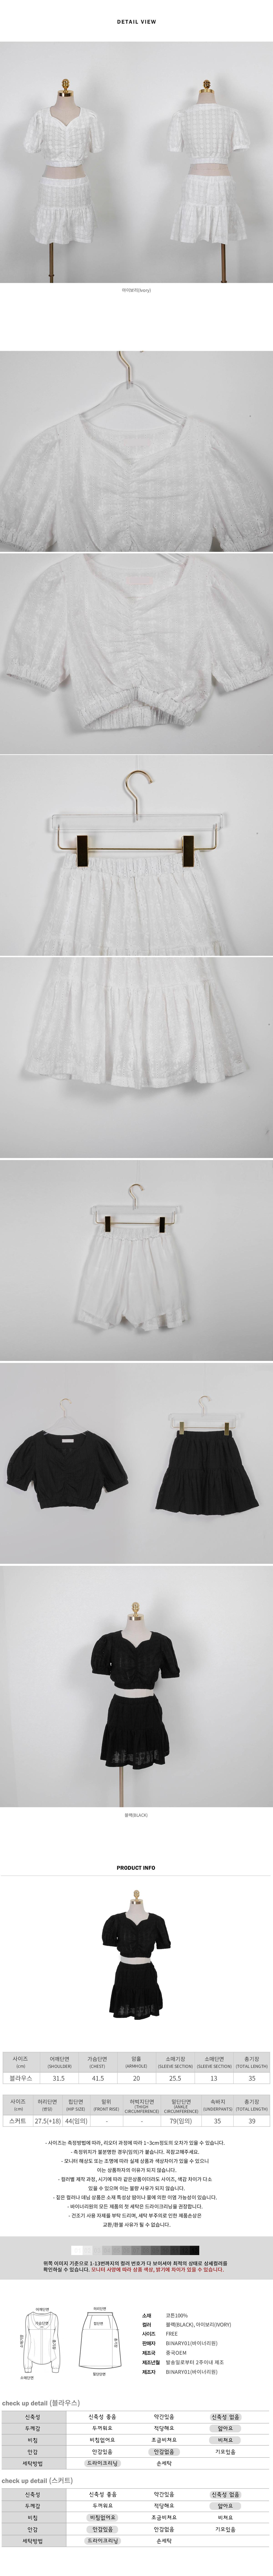 Bring crop blouse & skirt